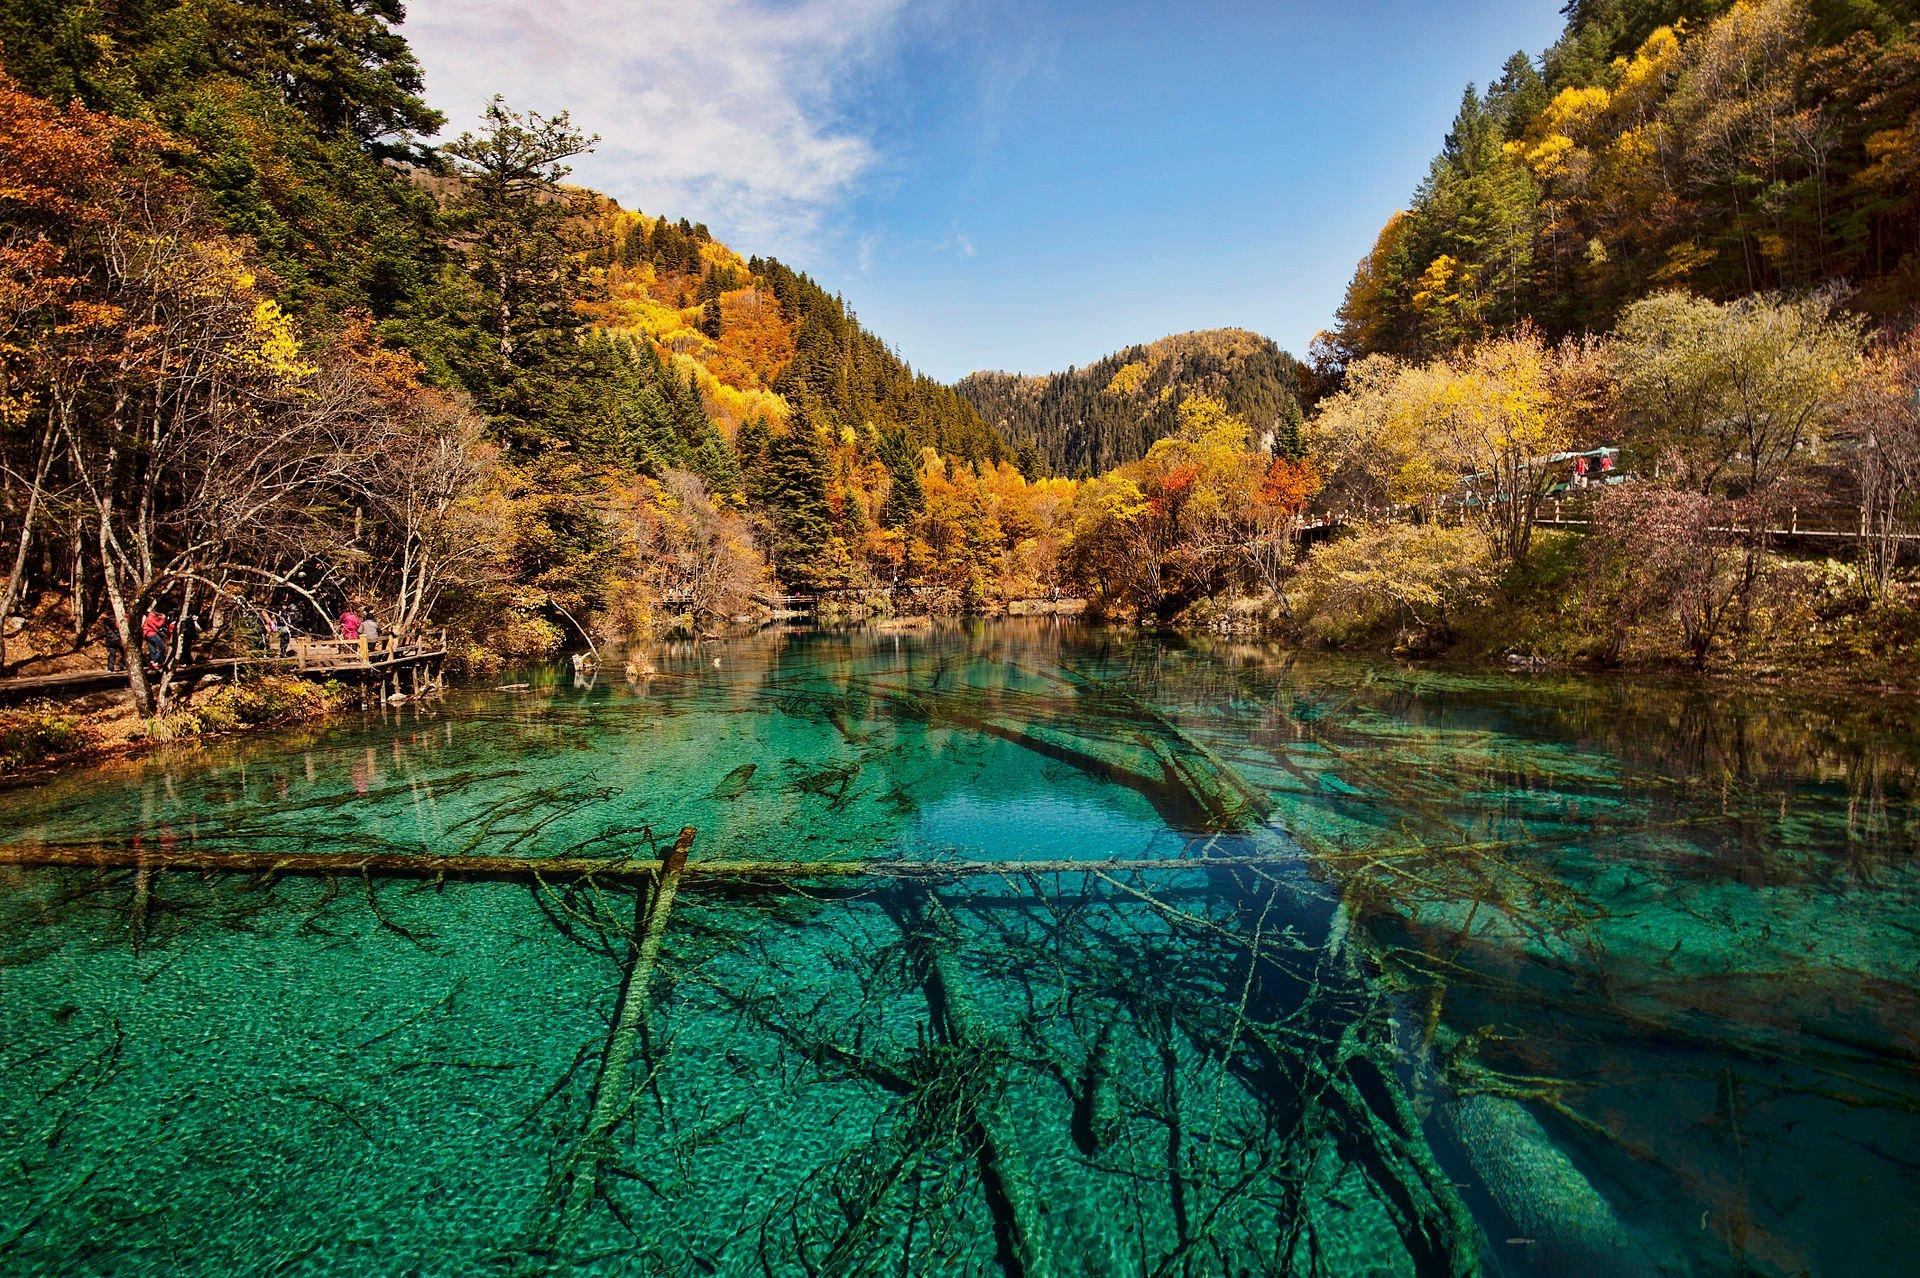 Jiuzhaigou Valley National Park in China - Best Season 2020